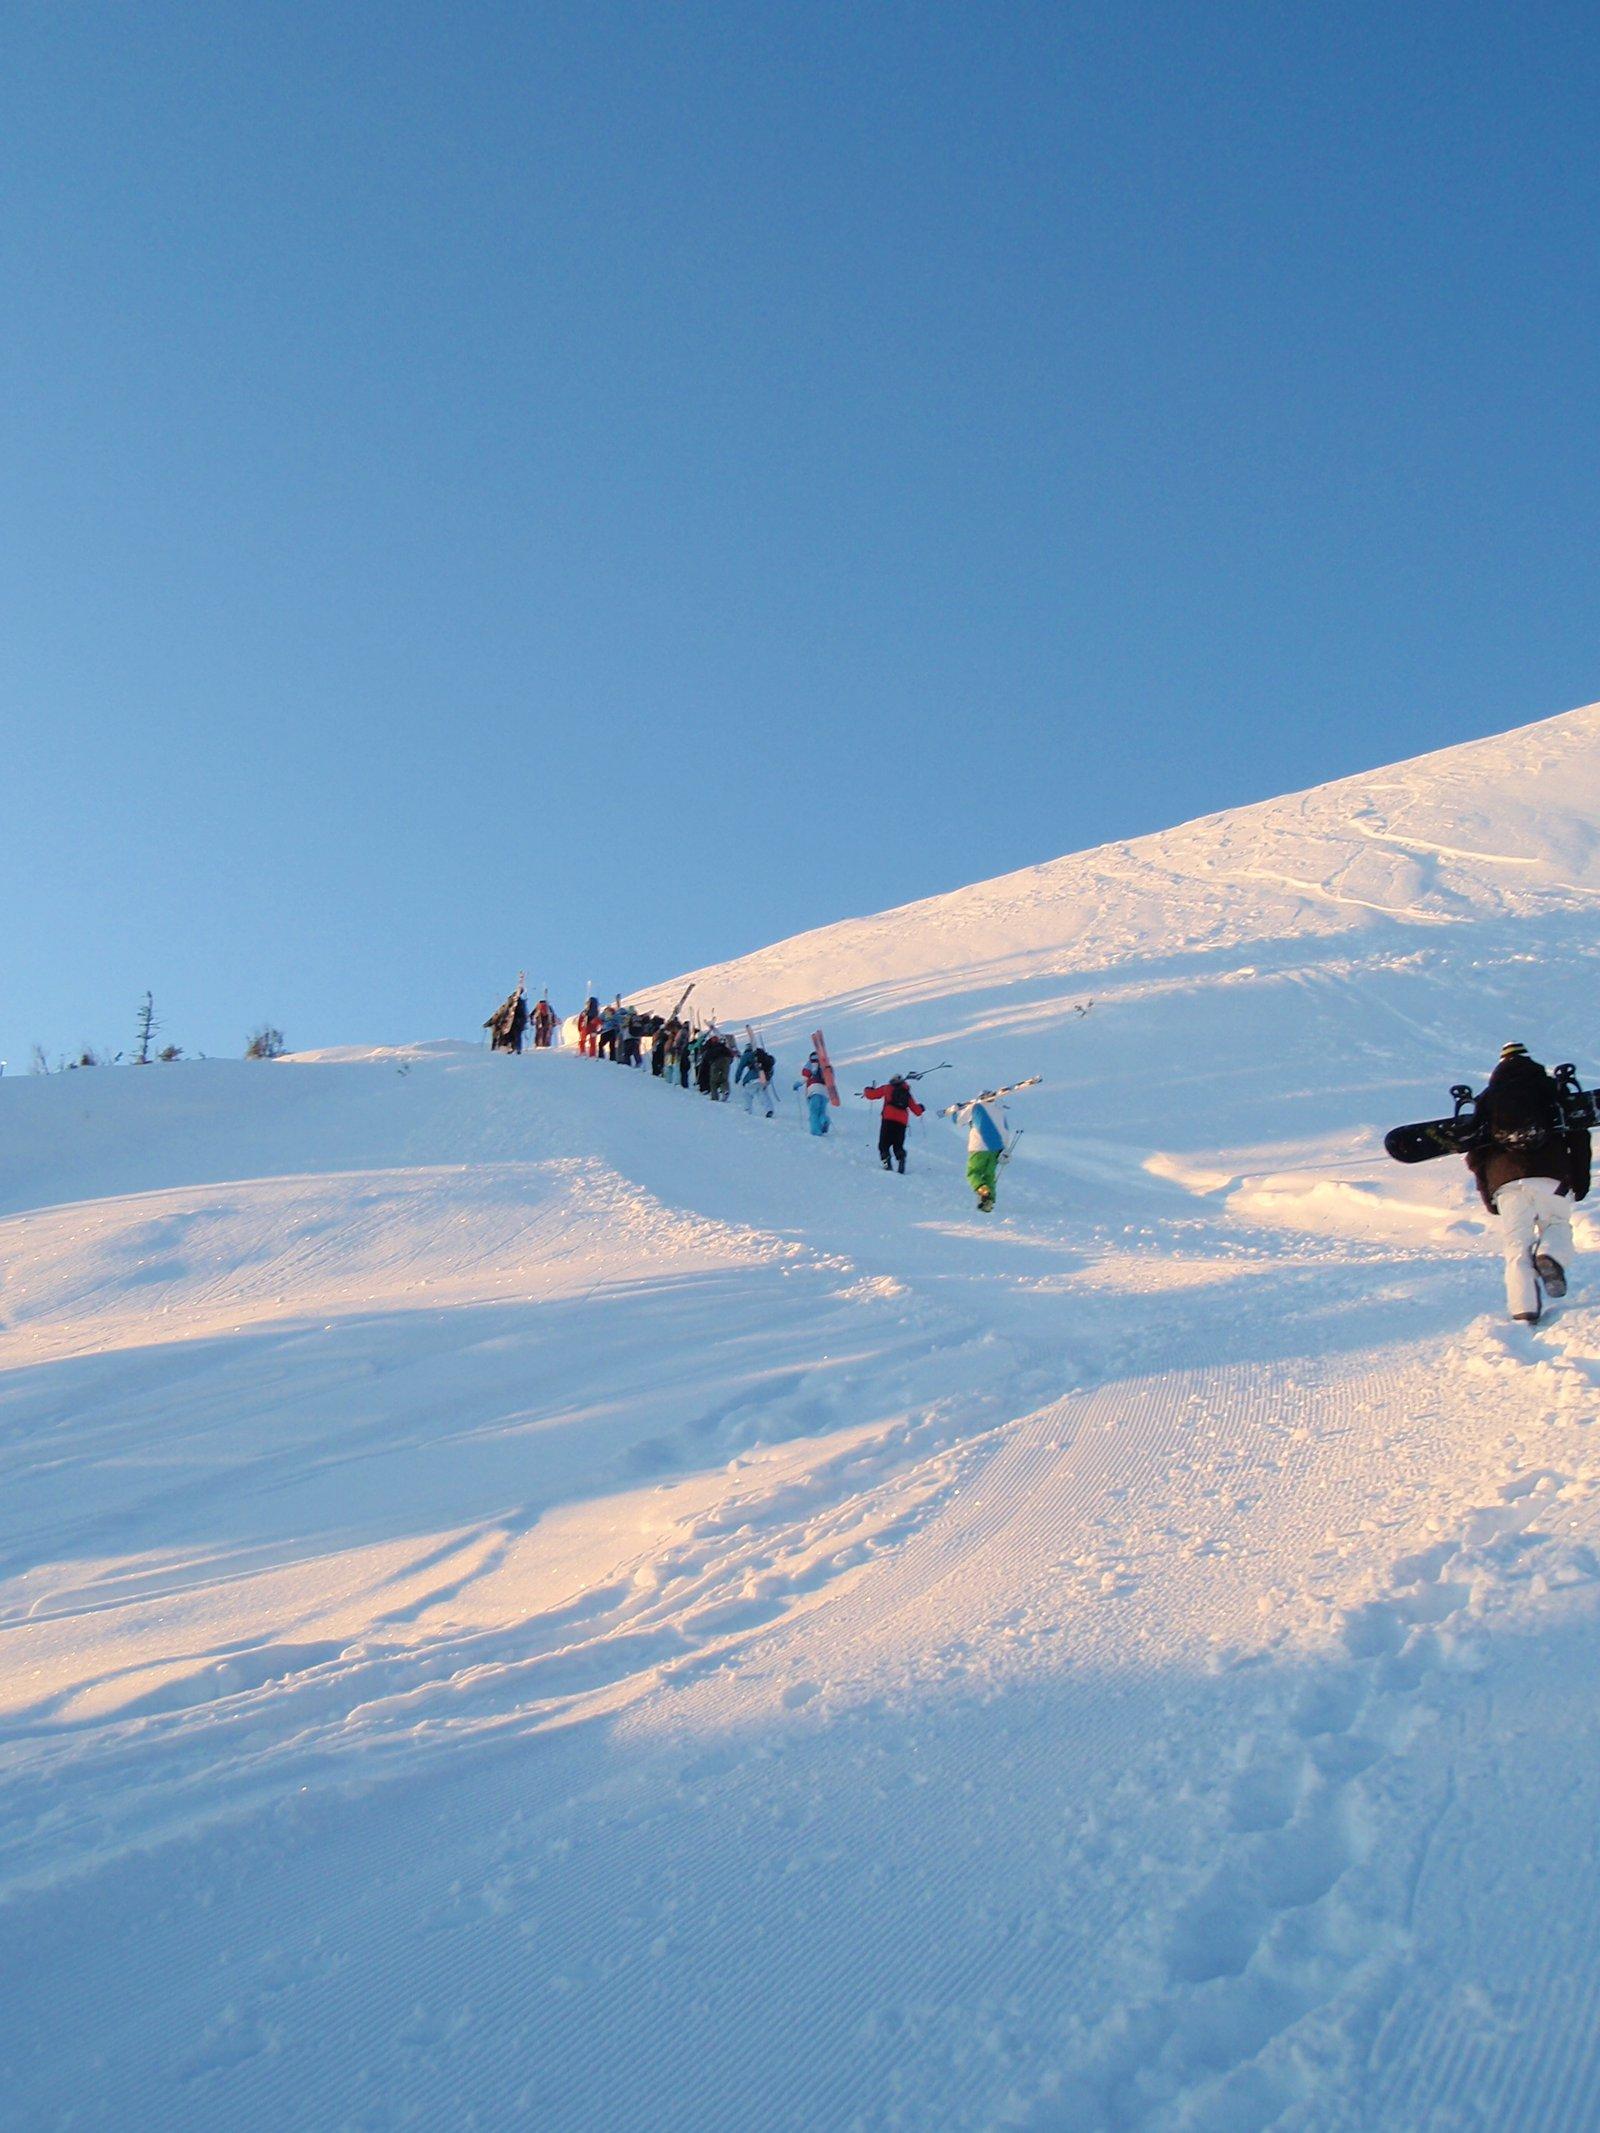 Hiking the mountain